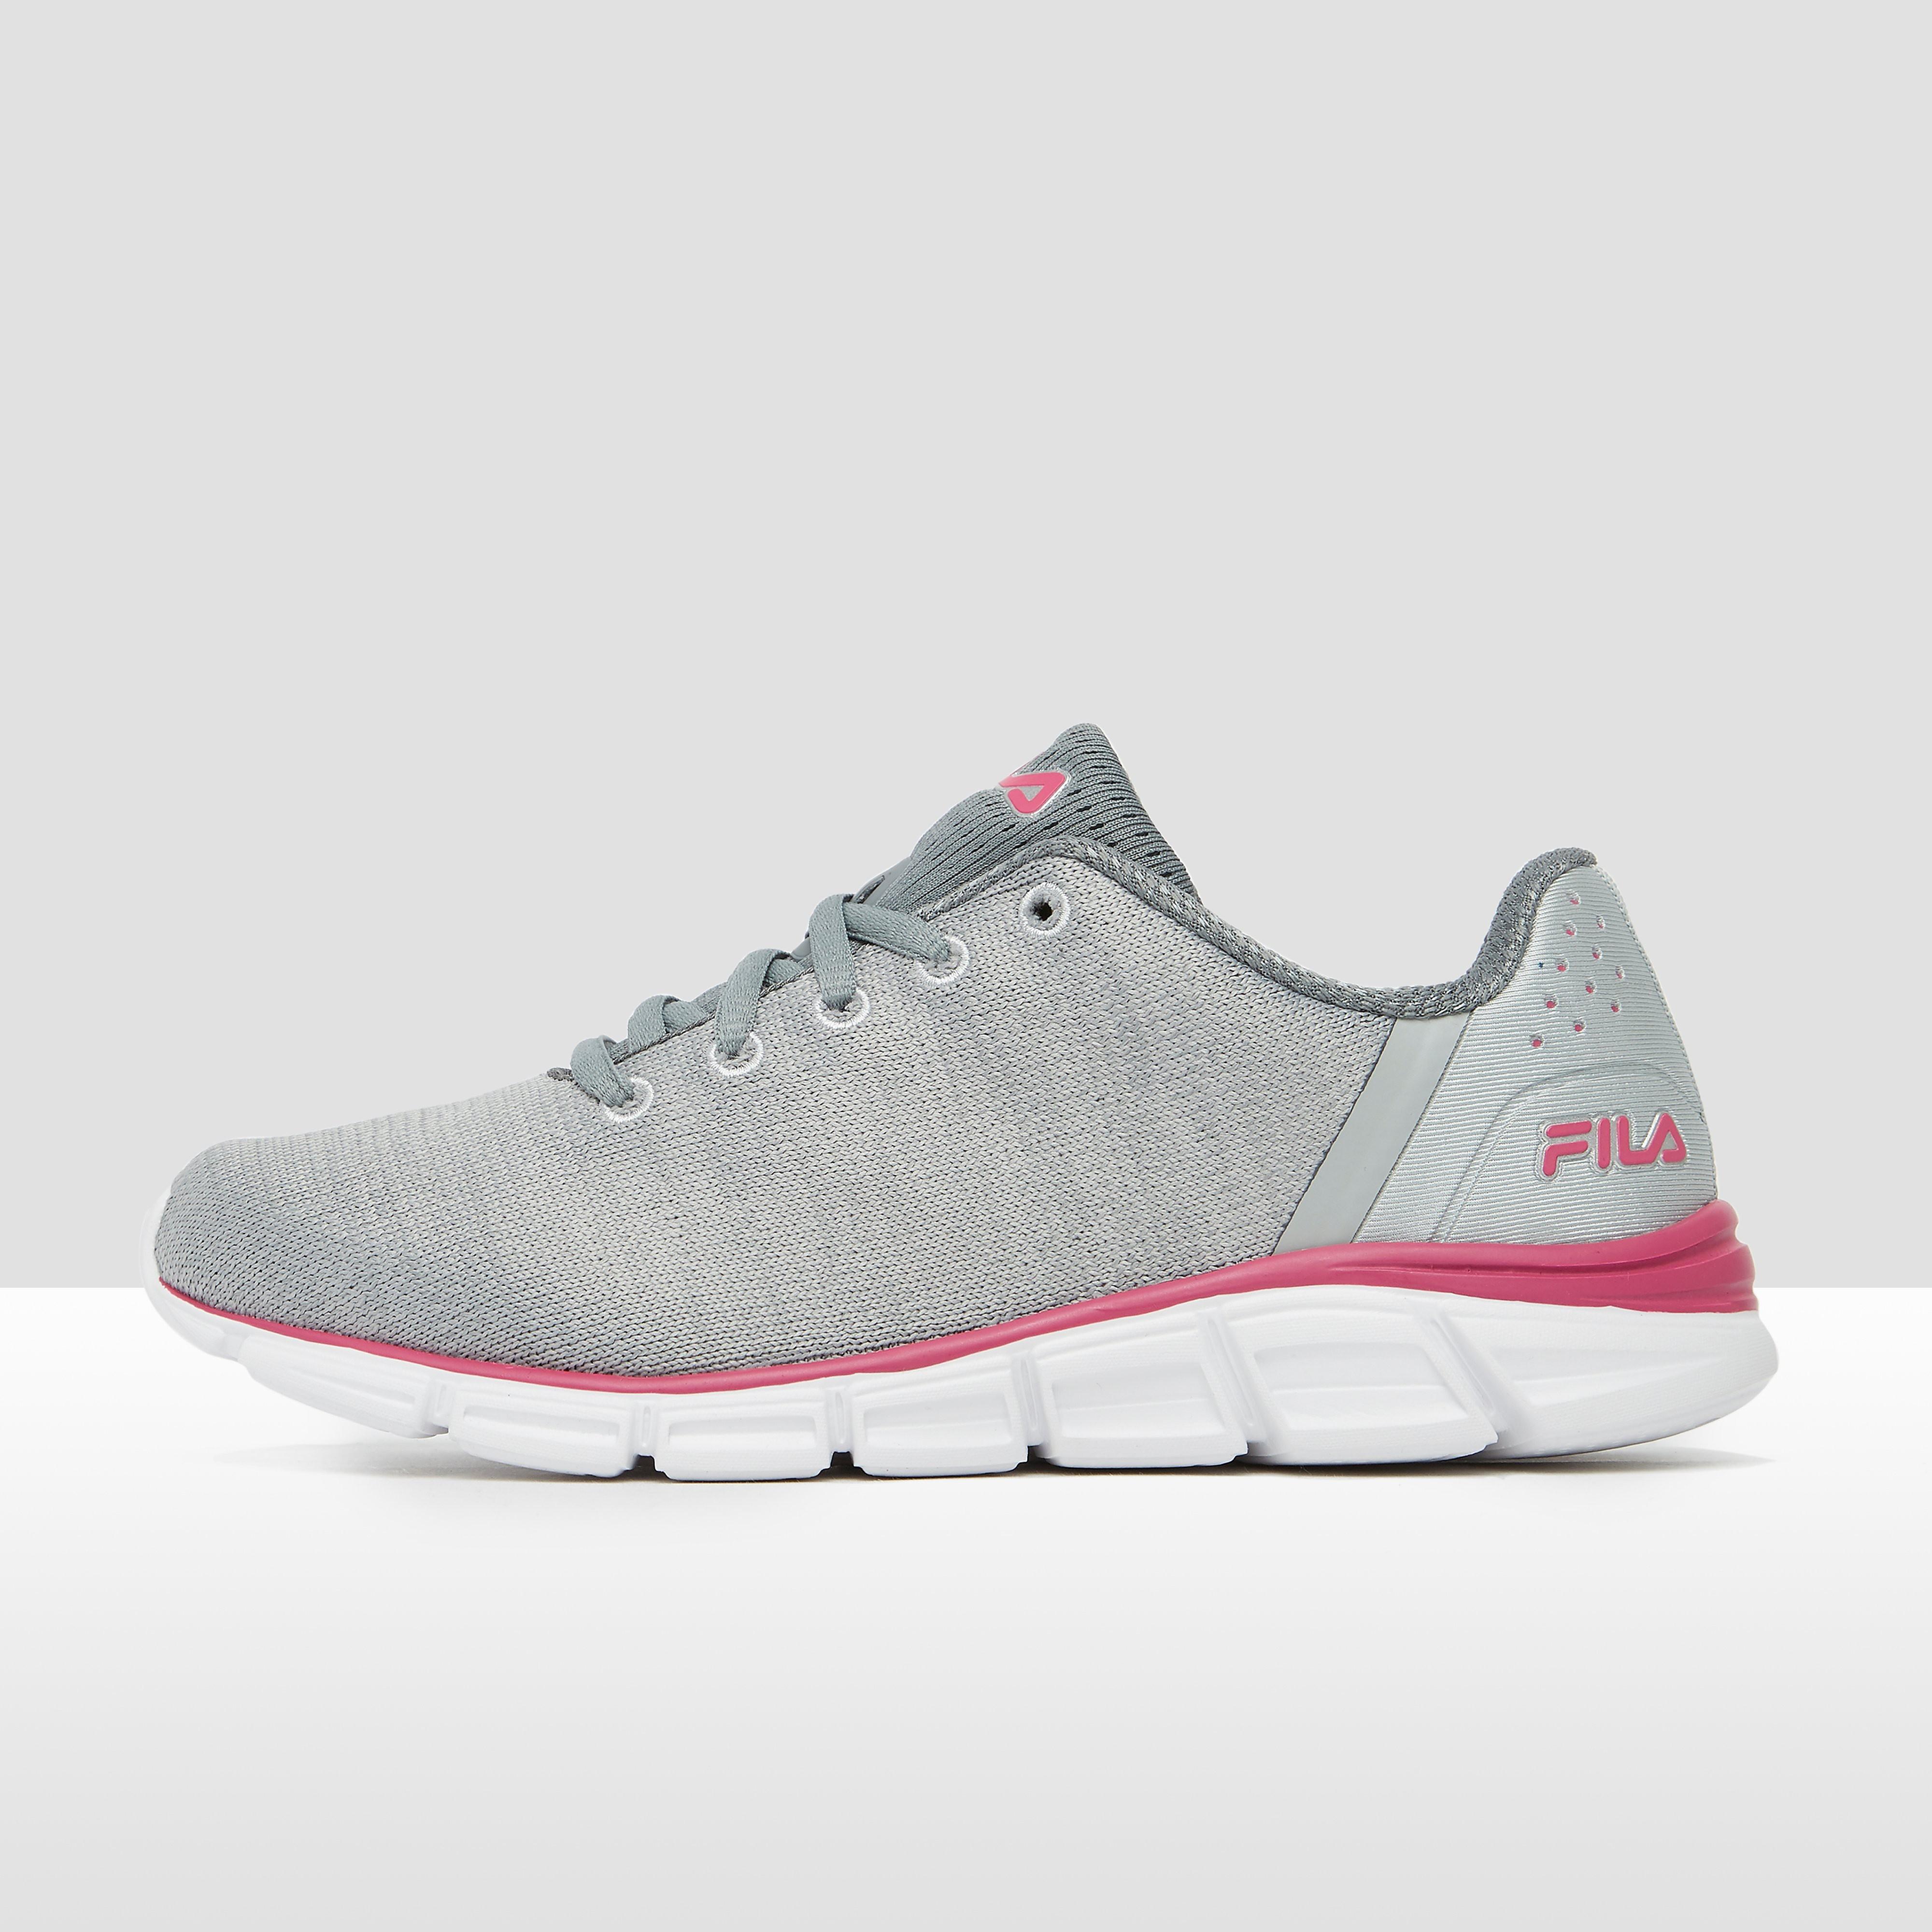 FILA Quickstart 2 hardloopschoenen grijs/roze dames Dames